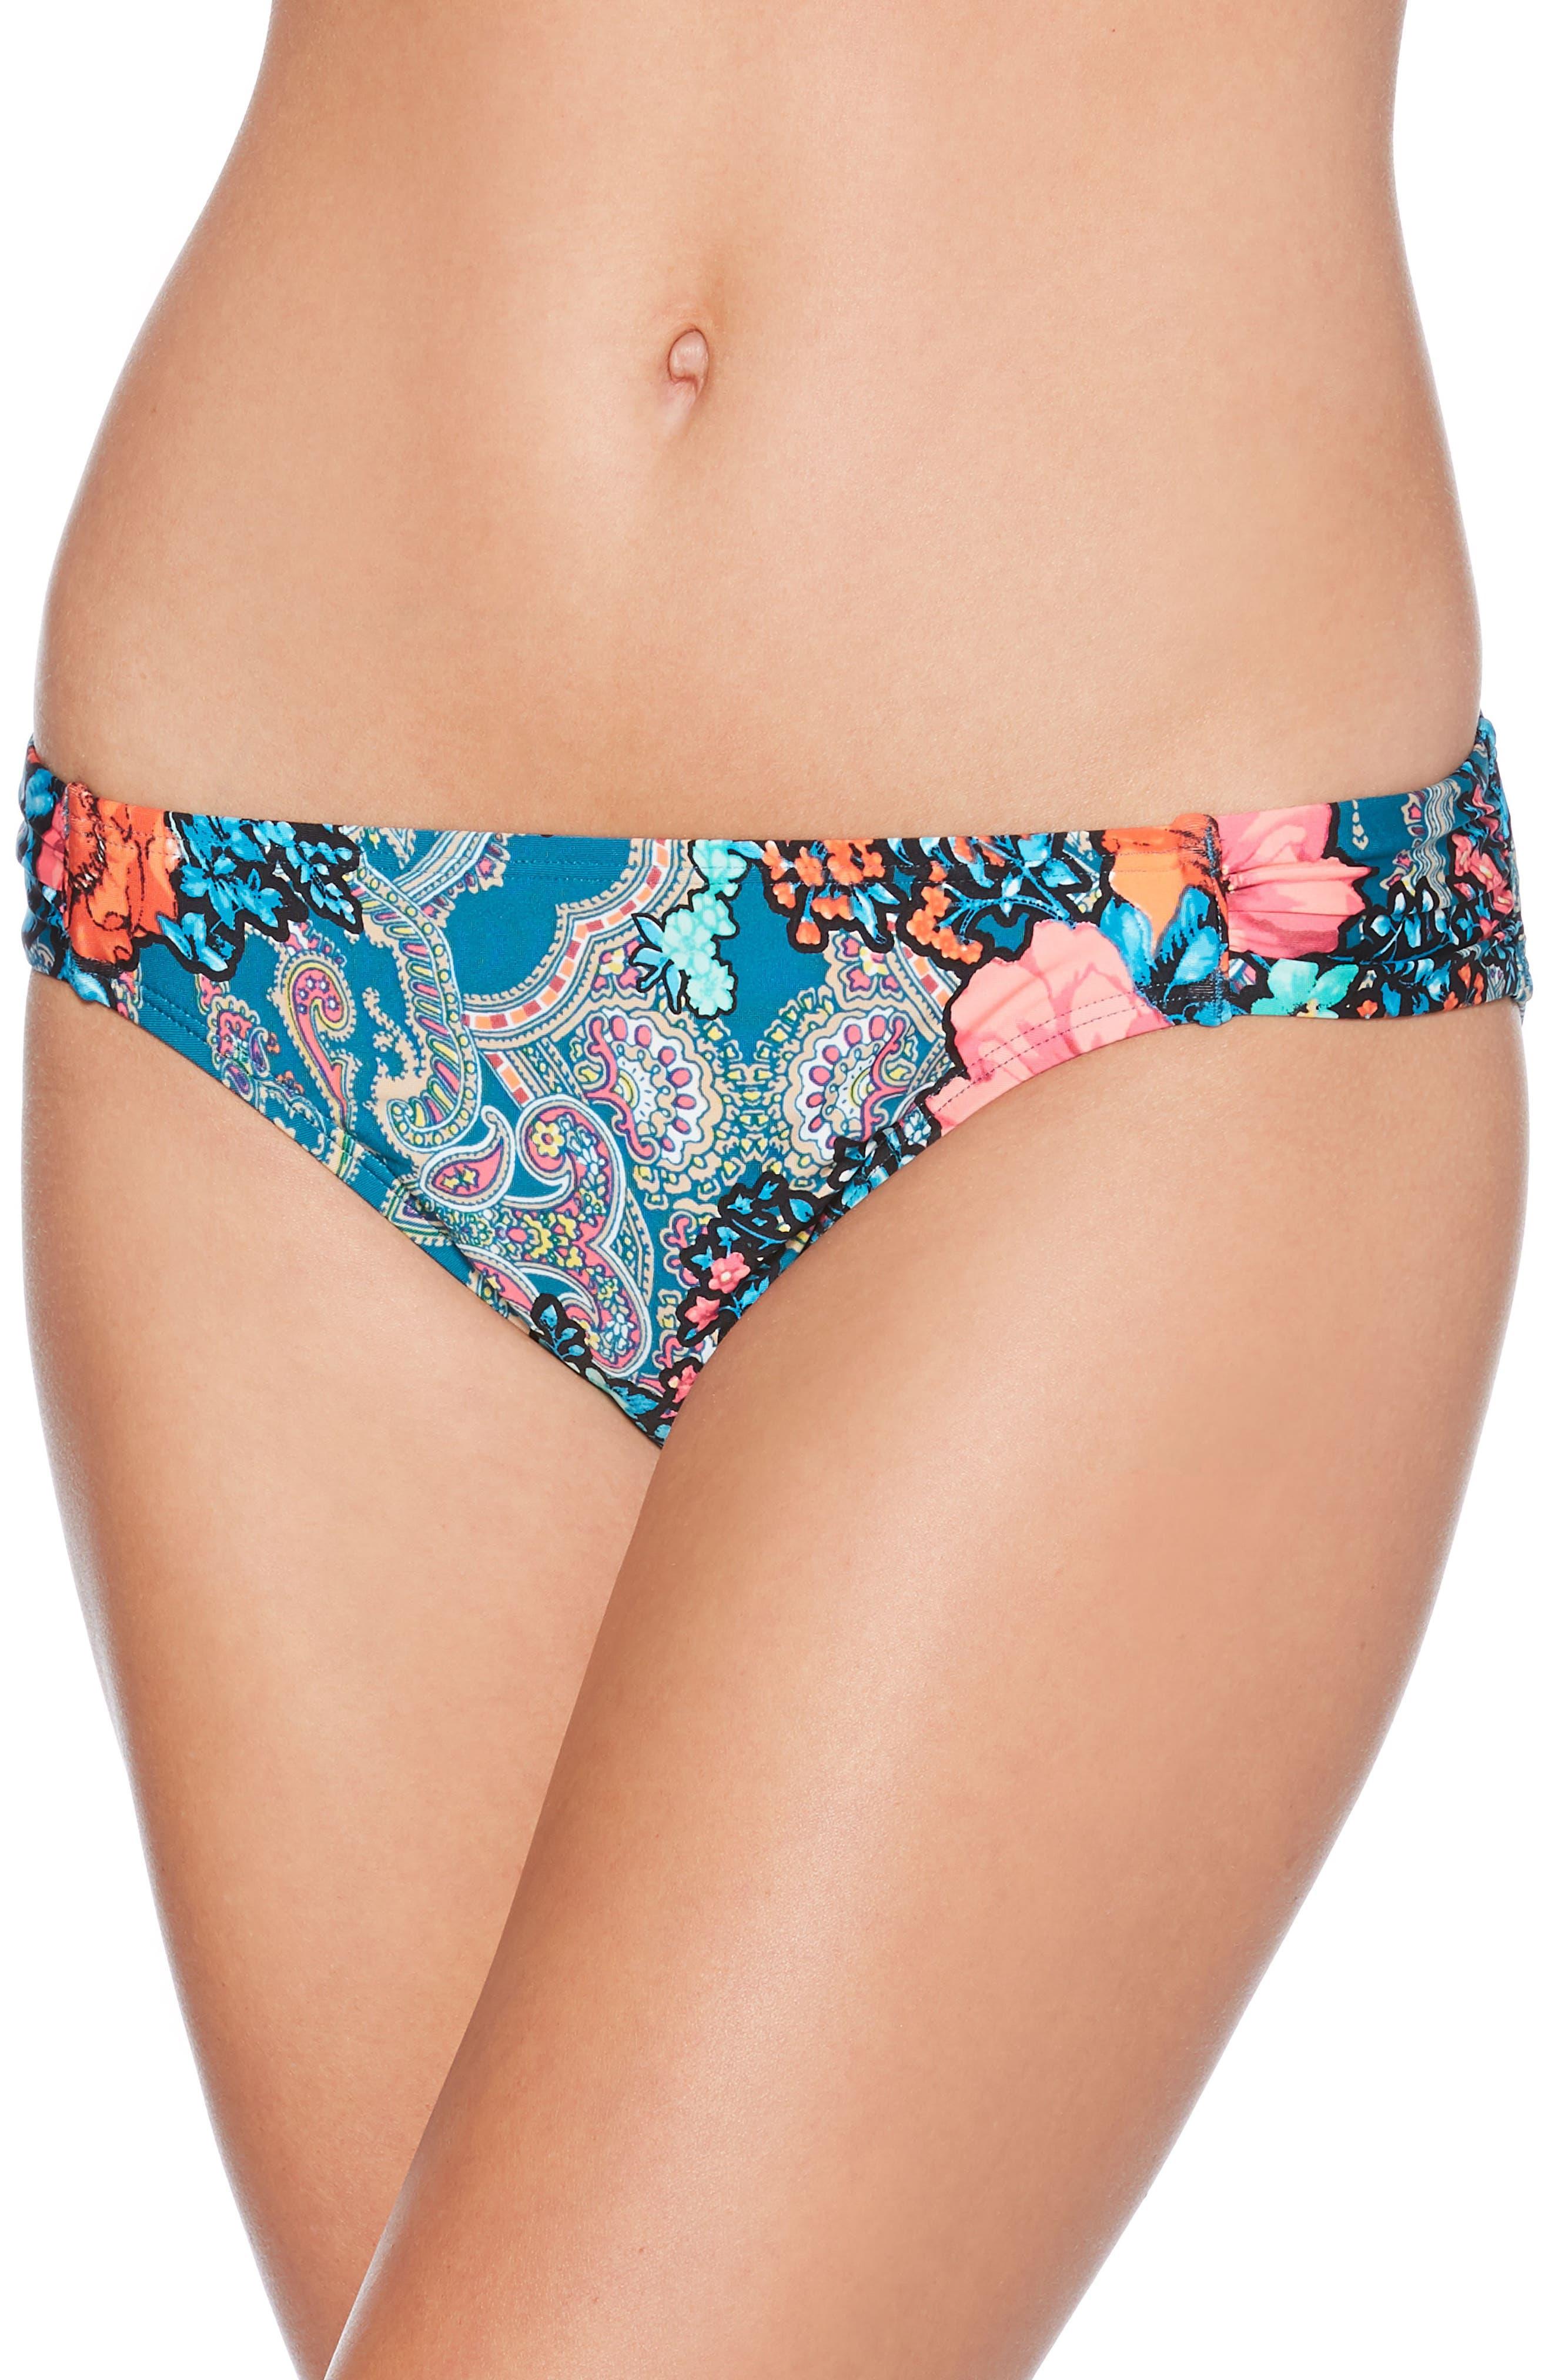 Floral Paisley Hipster Bikini Bottoms,                         Main,                         color, Deep Teal